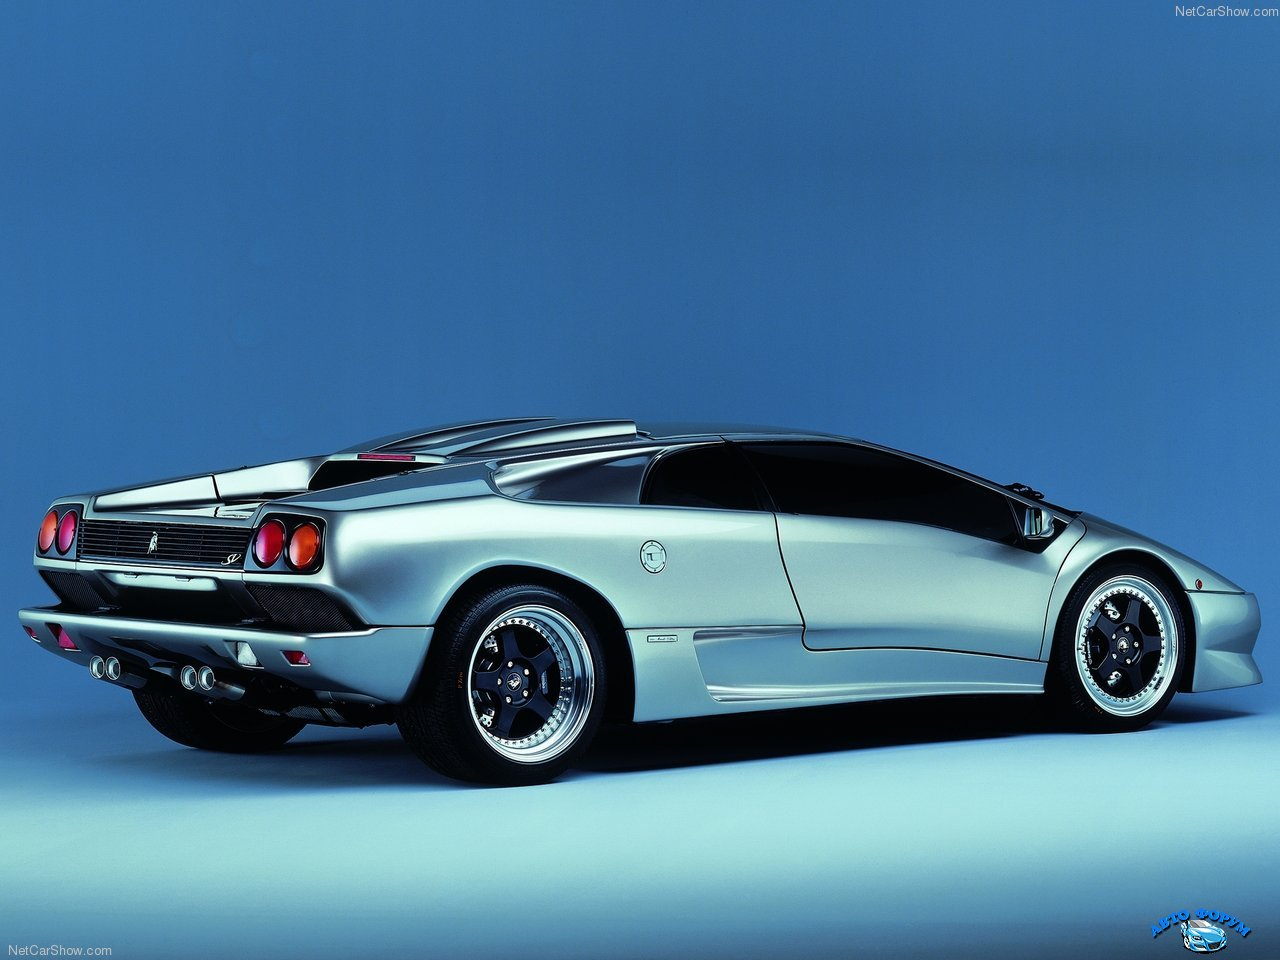 Lamborghini-Diablo_SV_1996_1280x960_wallpaper_03.jpg